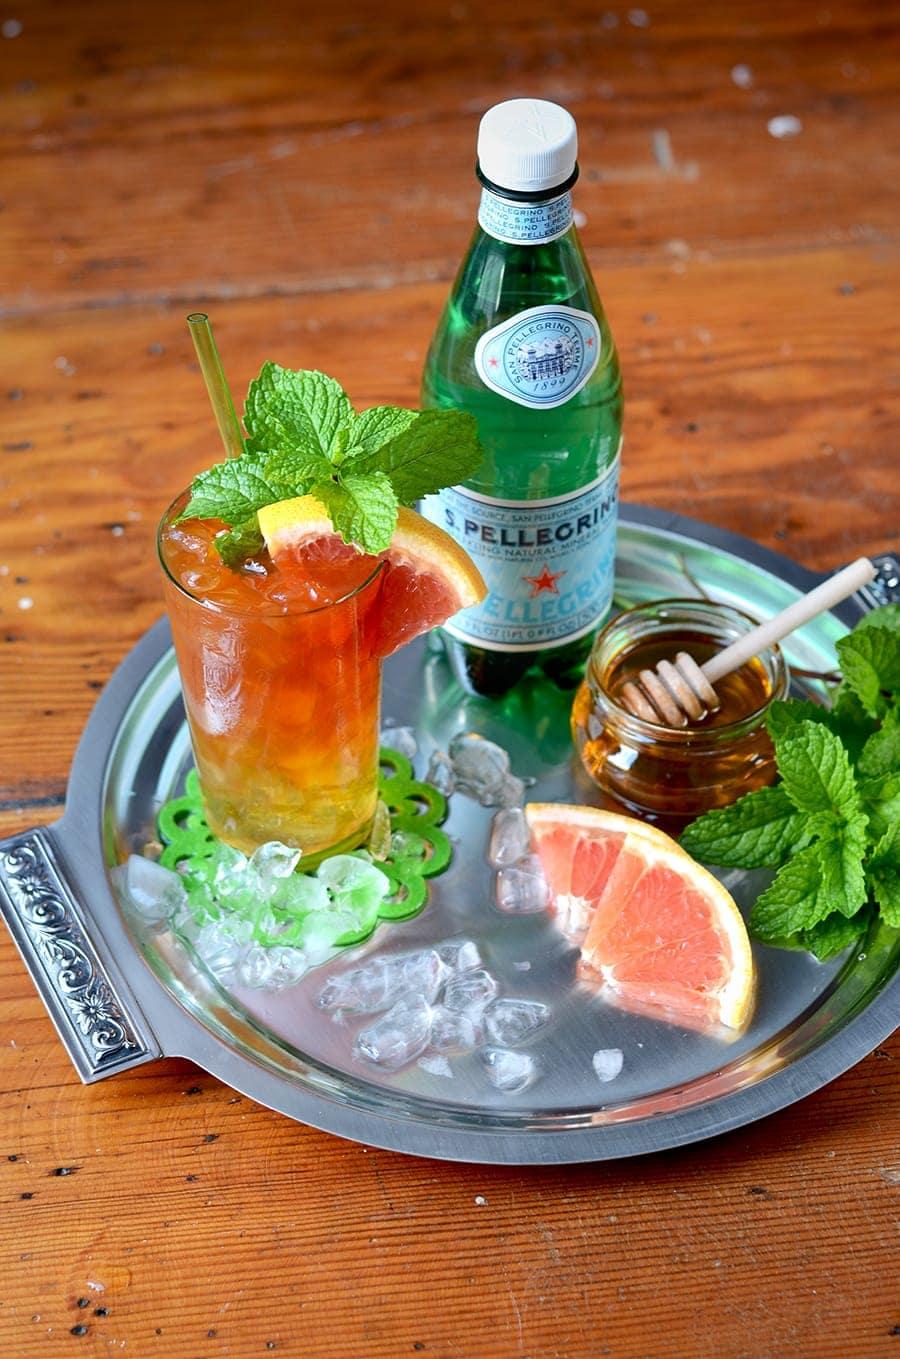 Tray with Skinny Iced Tea Cocktails Web - Skinny Iced Tea Cocktail </br>with Homemade Unsweetened Tea Vodka